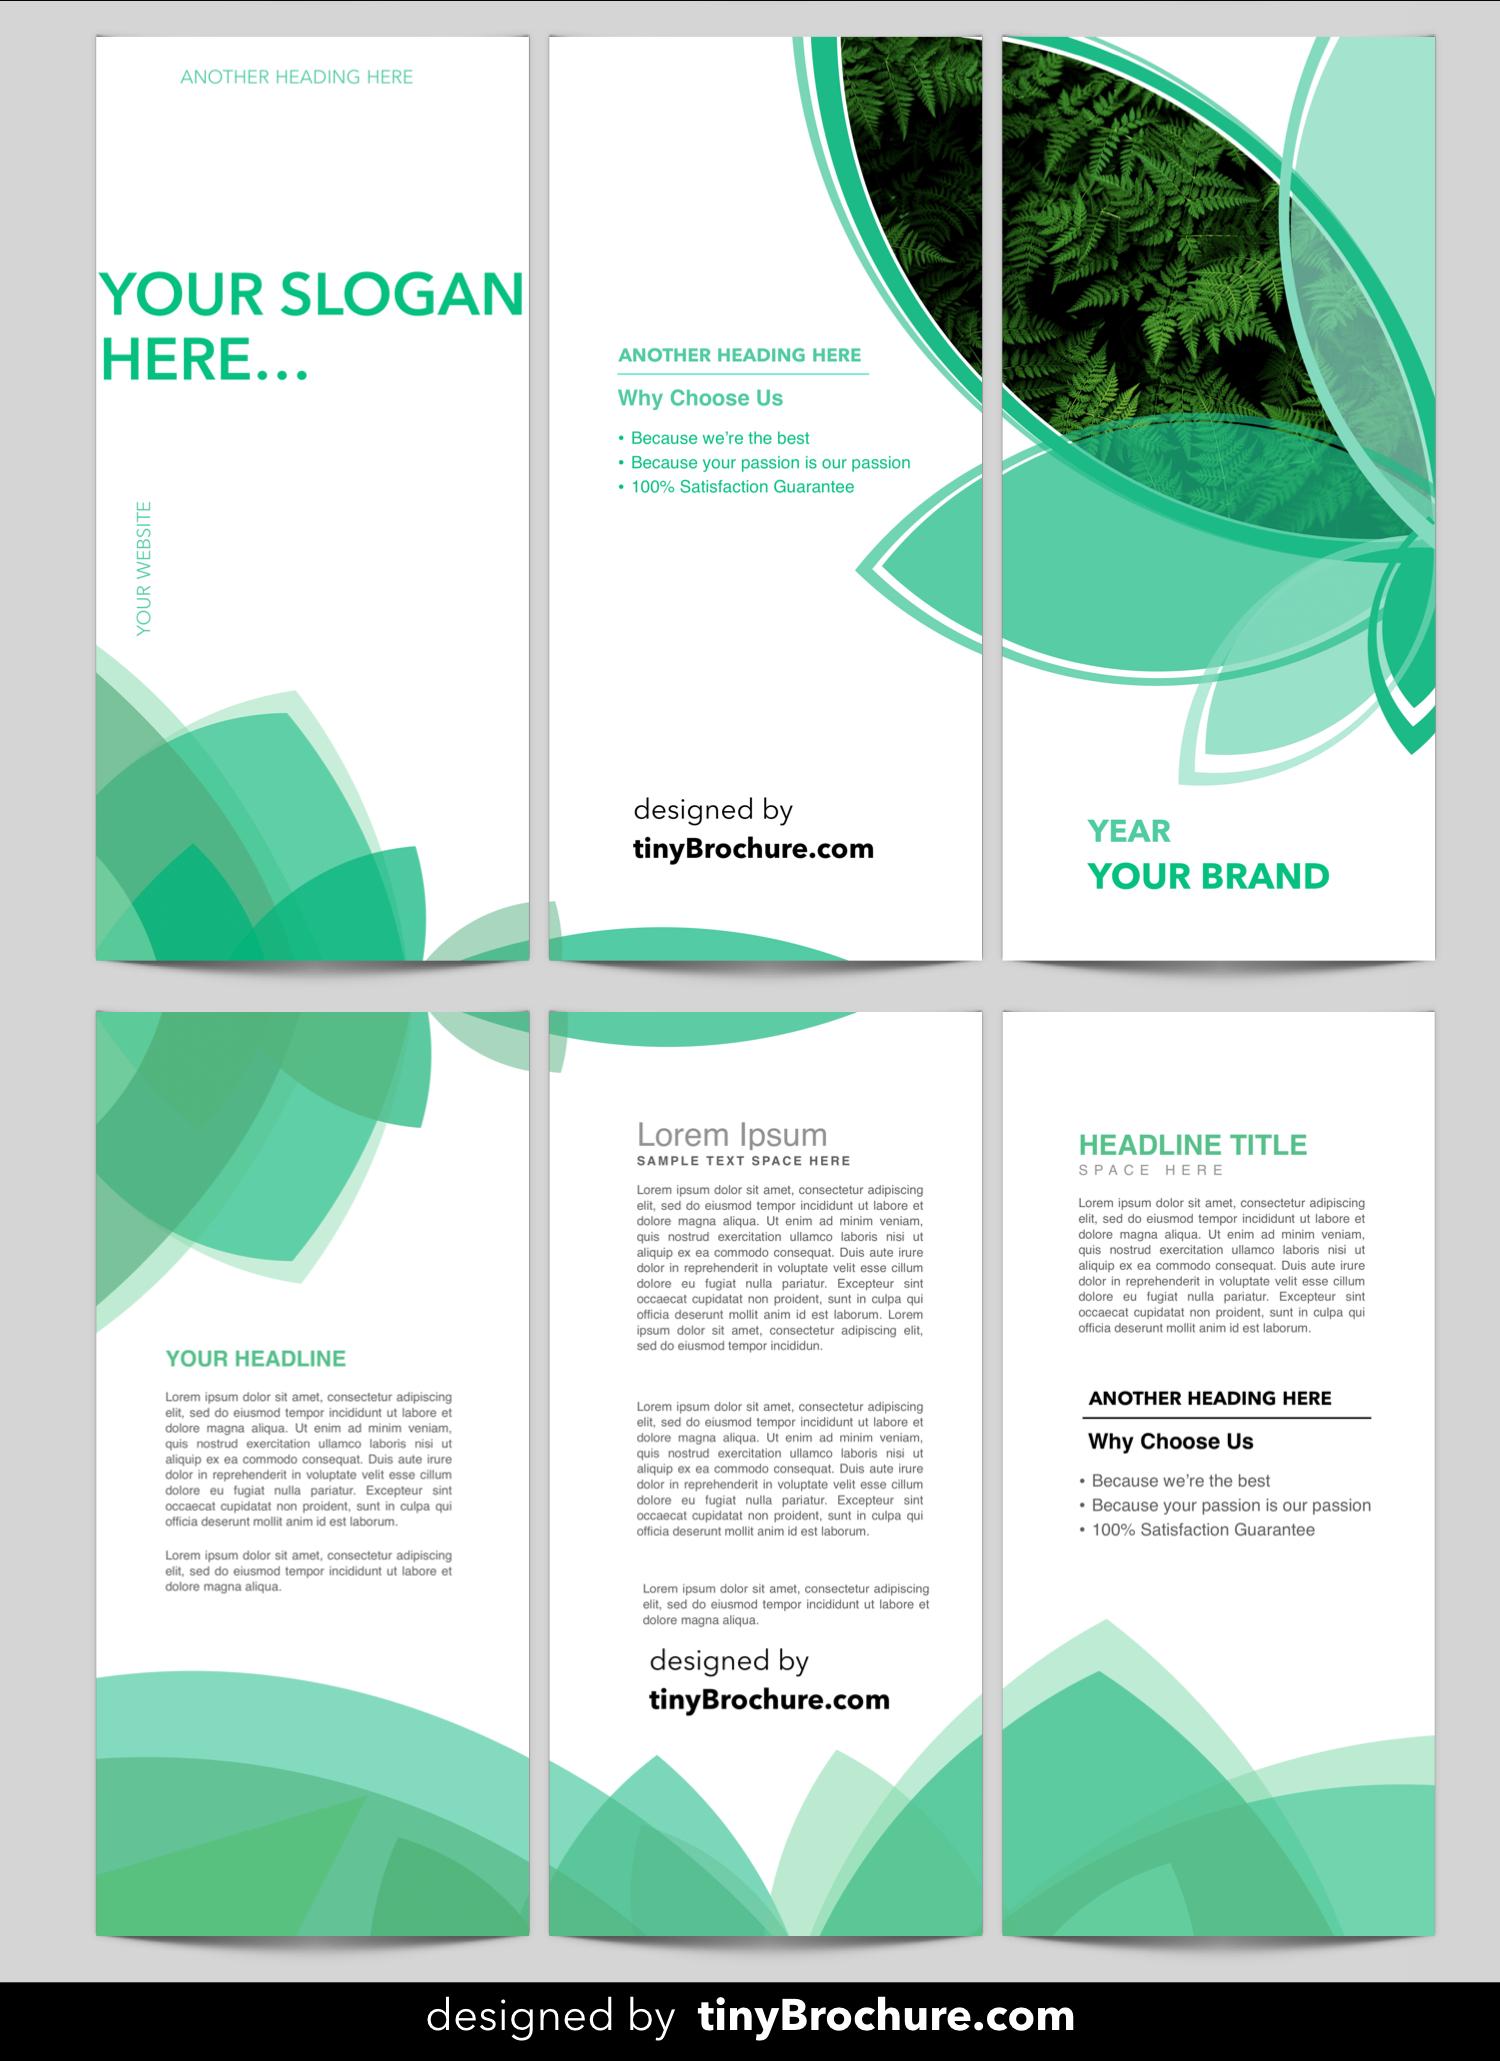 3 Panel Brochure Template Word Format Free Download with Three Panel Brochure Template